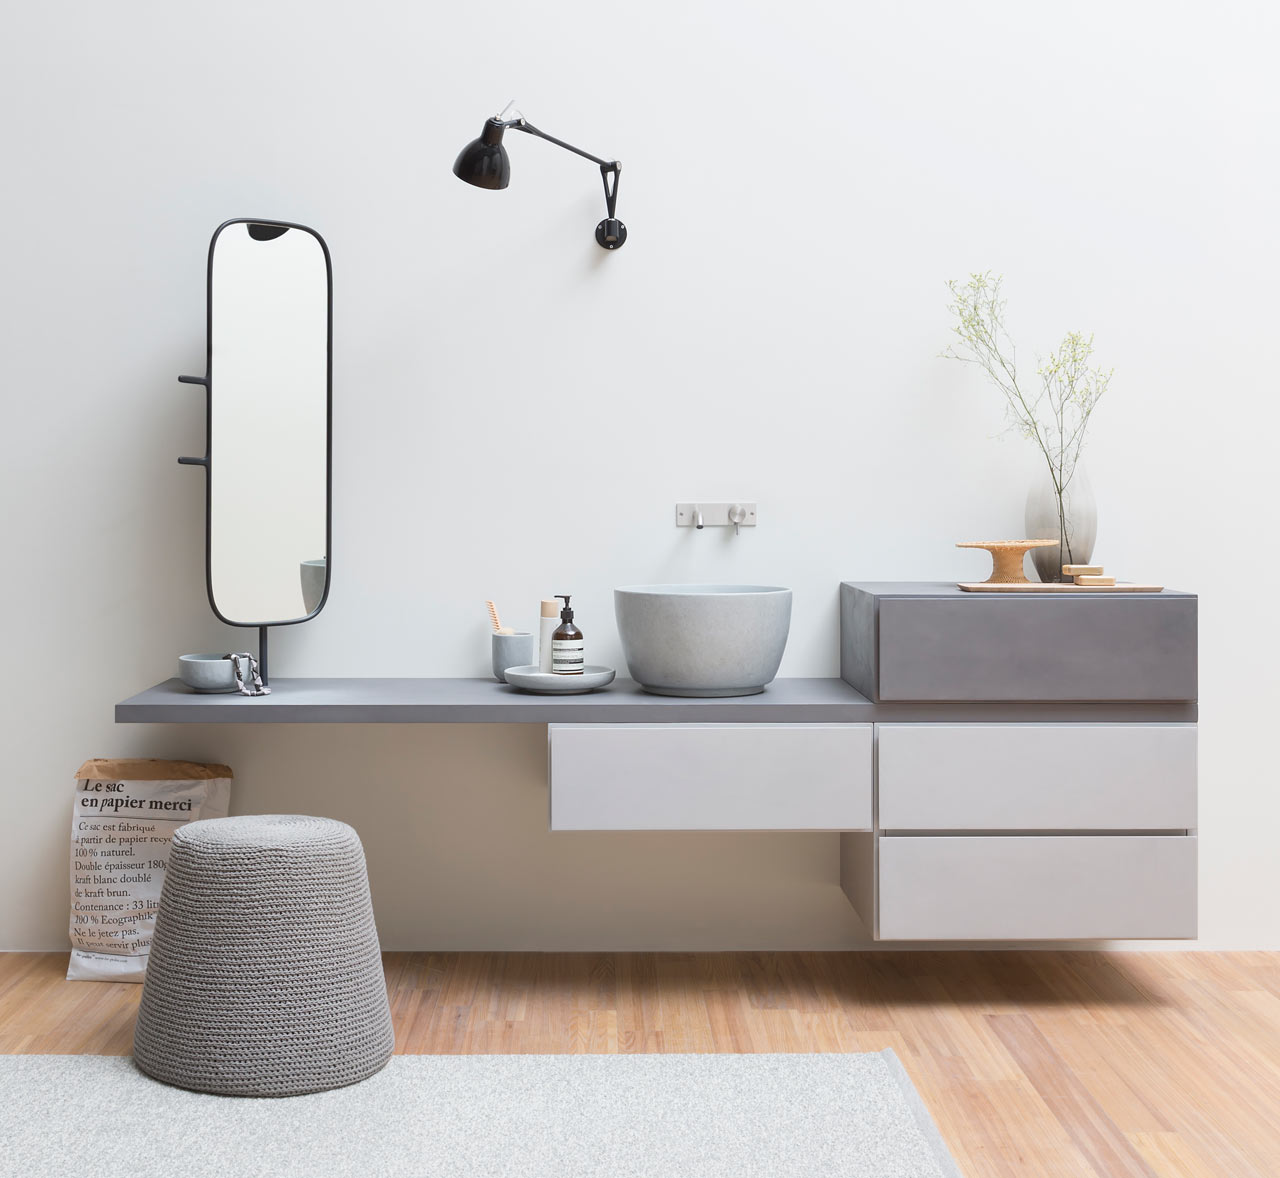 Modular Units for a Modern Bathroom - Design Milk